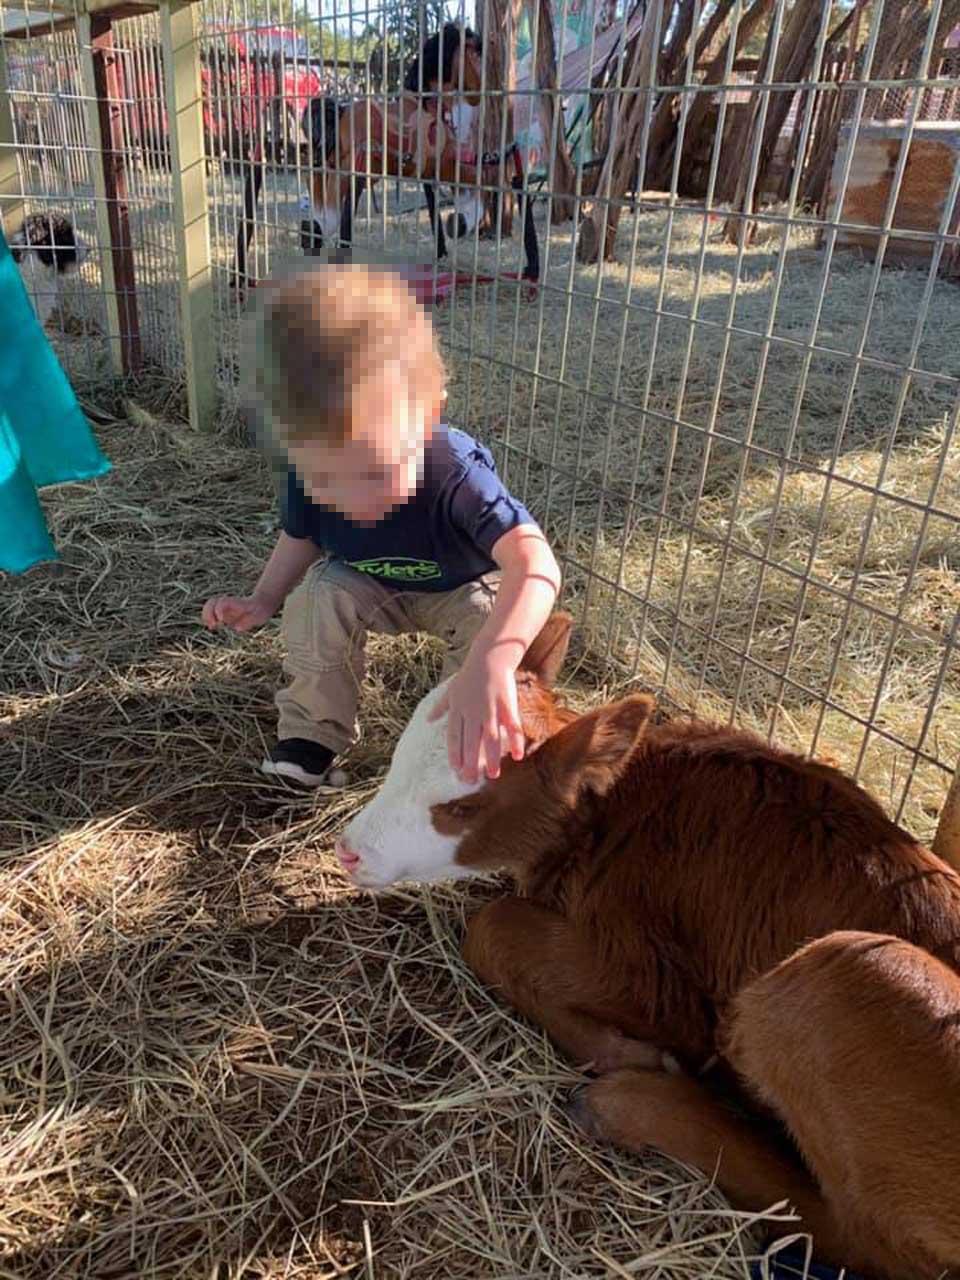 Niño alimentando a la ternera